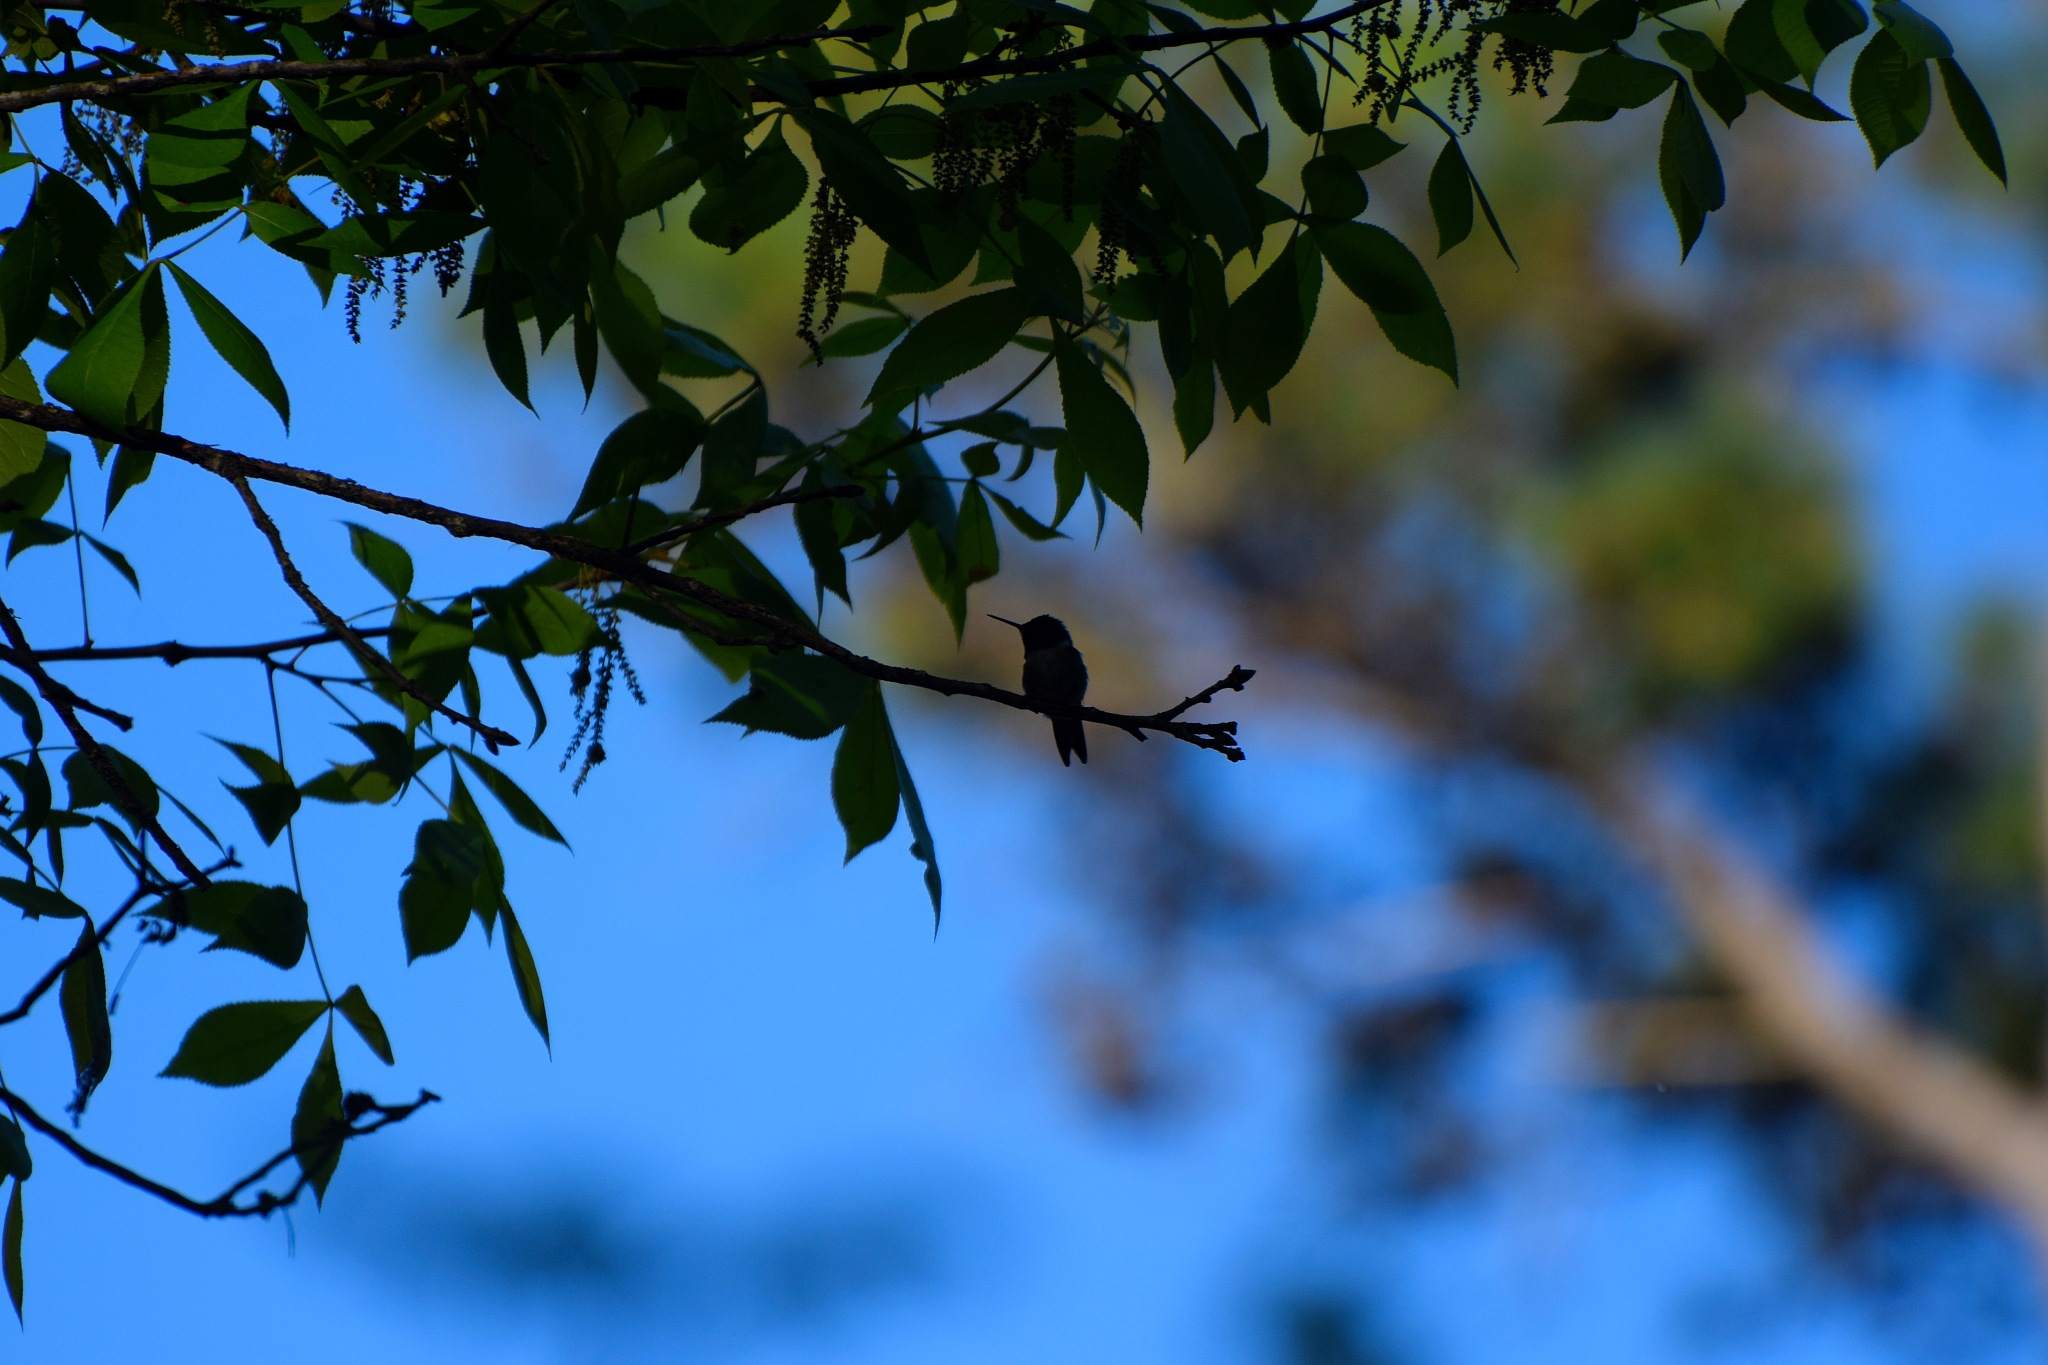 Nature's Birds 494~Hummingbird Silhouette by Lawrence Scott Hess